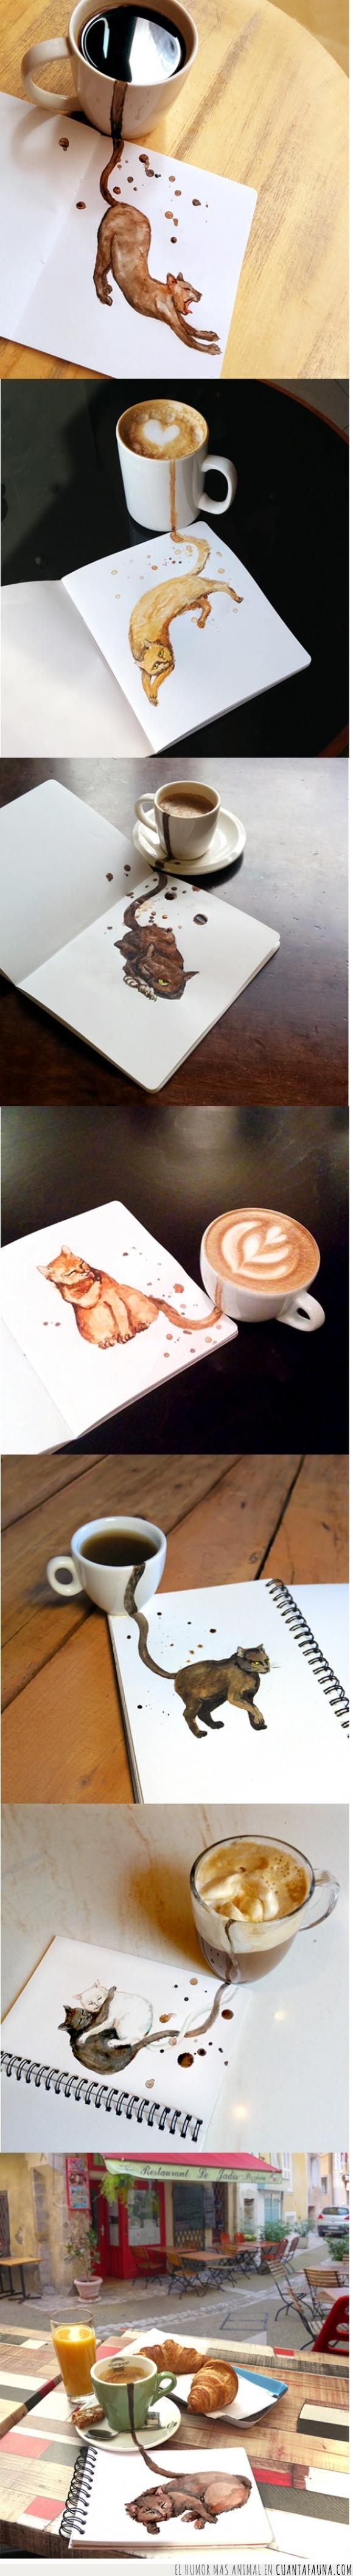 arte,café,felinos,gatos,manchas